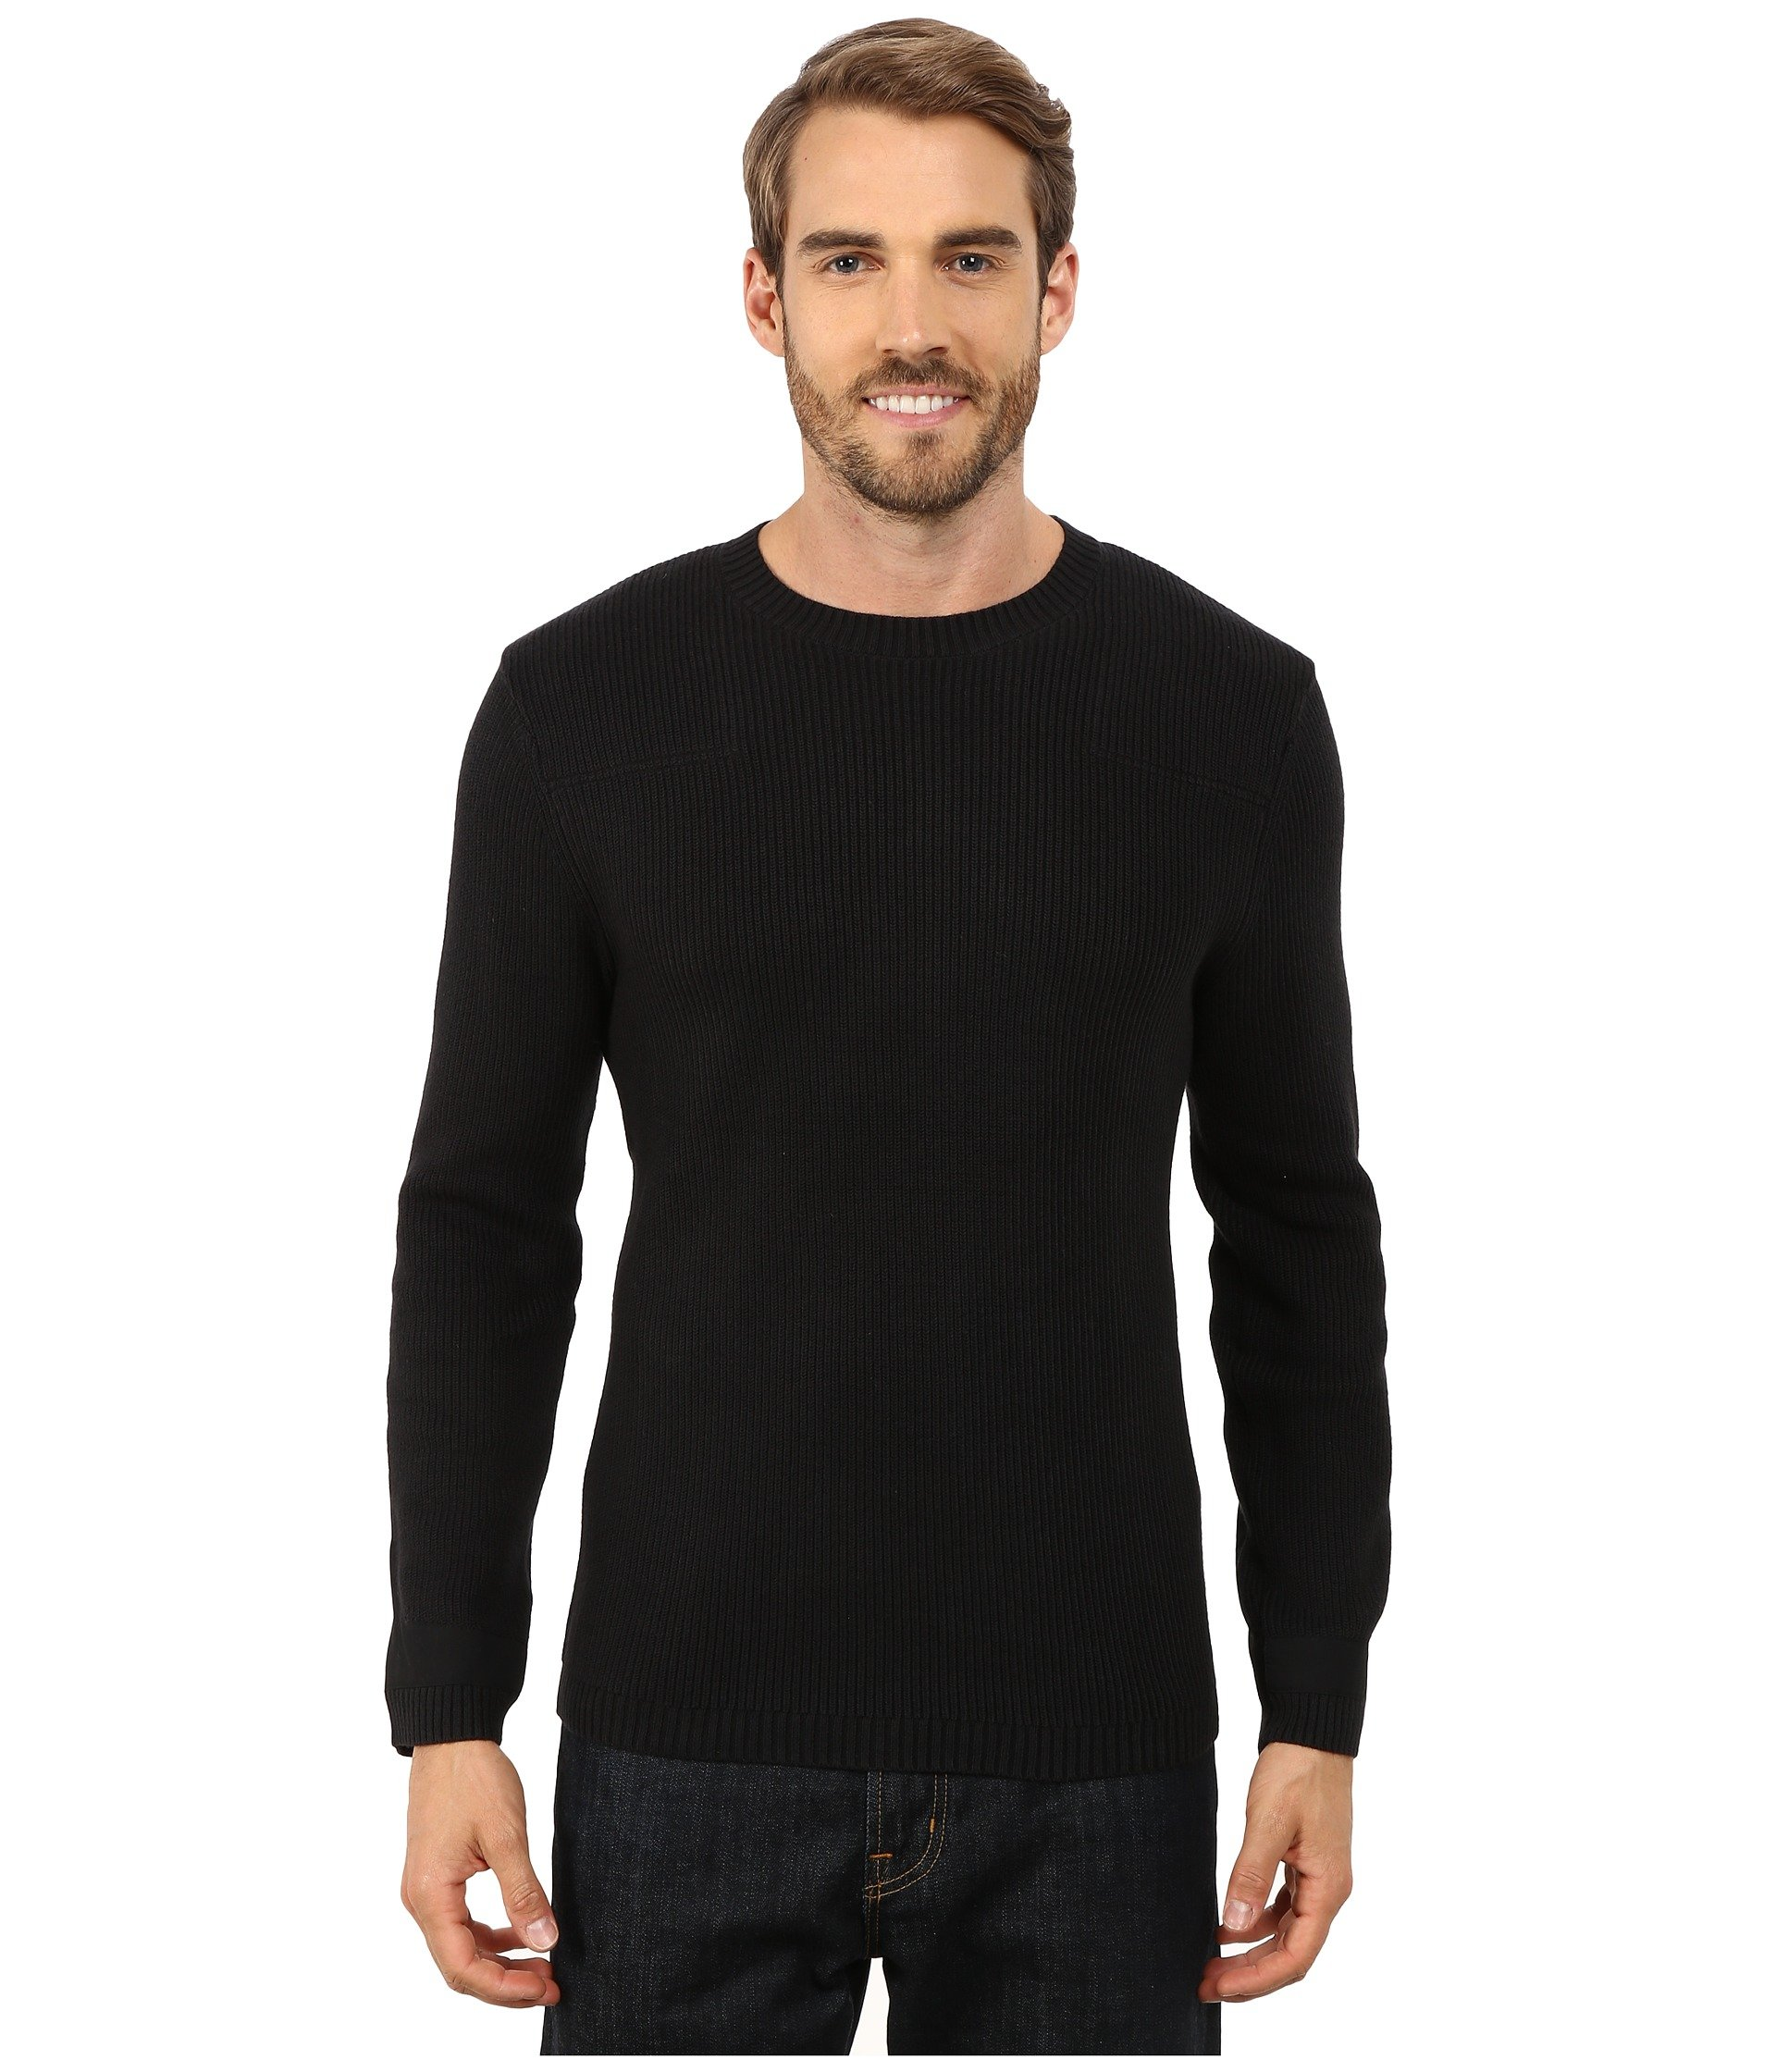 Sueter para Hombre Toadandamp;Co Emmett Crewneck Sweater  + Toad&Co en VeoyCompro.net